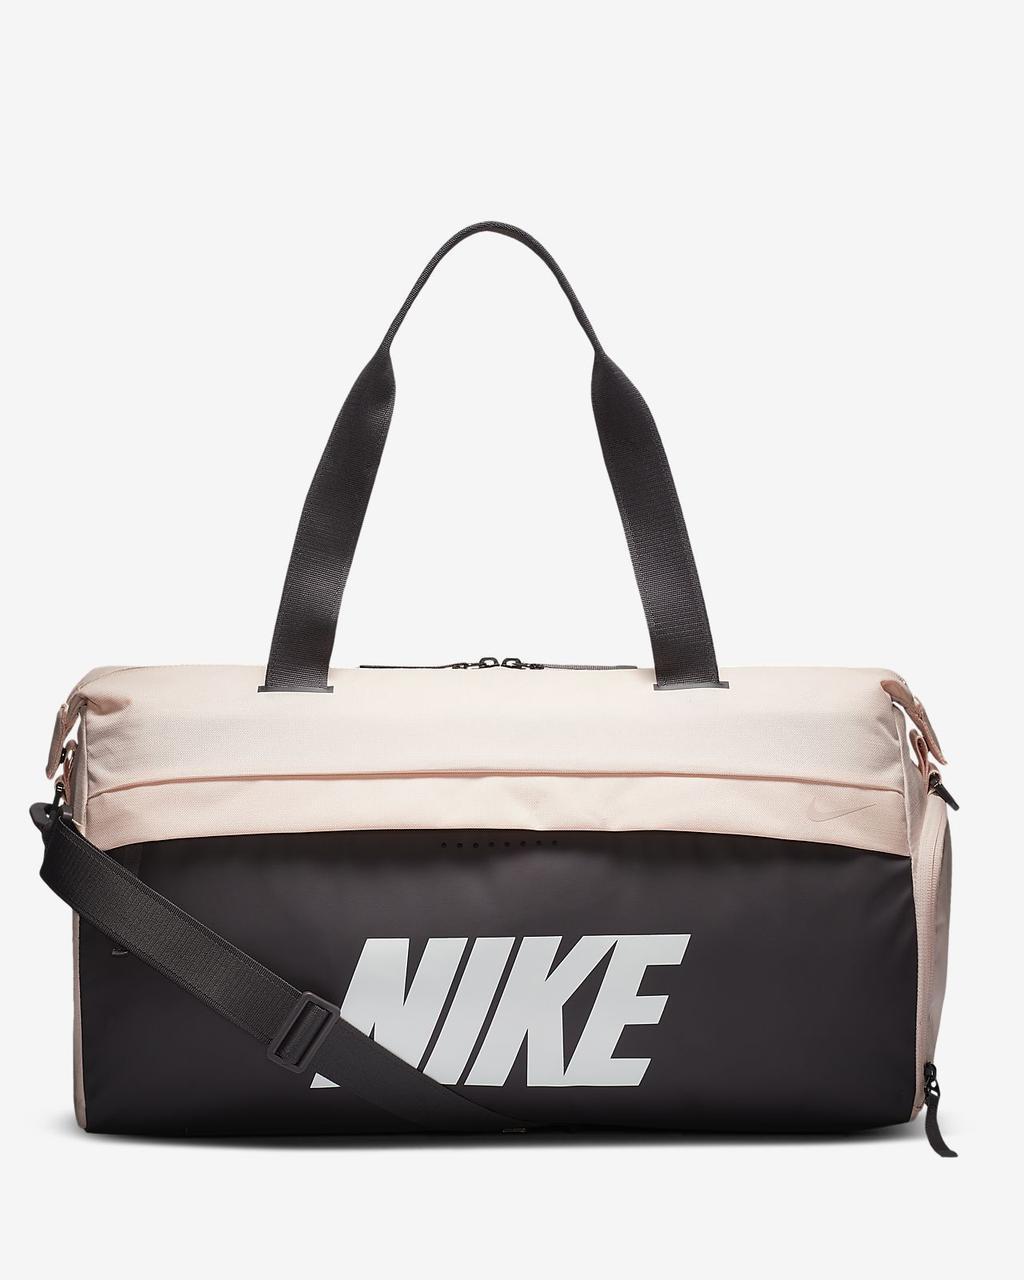 e922b8c8990d Женская спортивная сумка NIKE RADIATE CLUB BA6014-664: продажа, цена ...